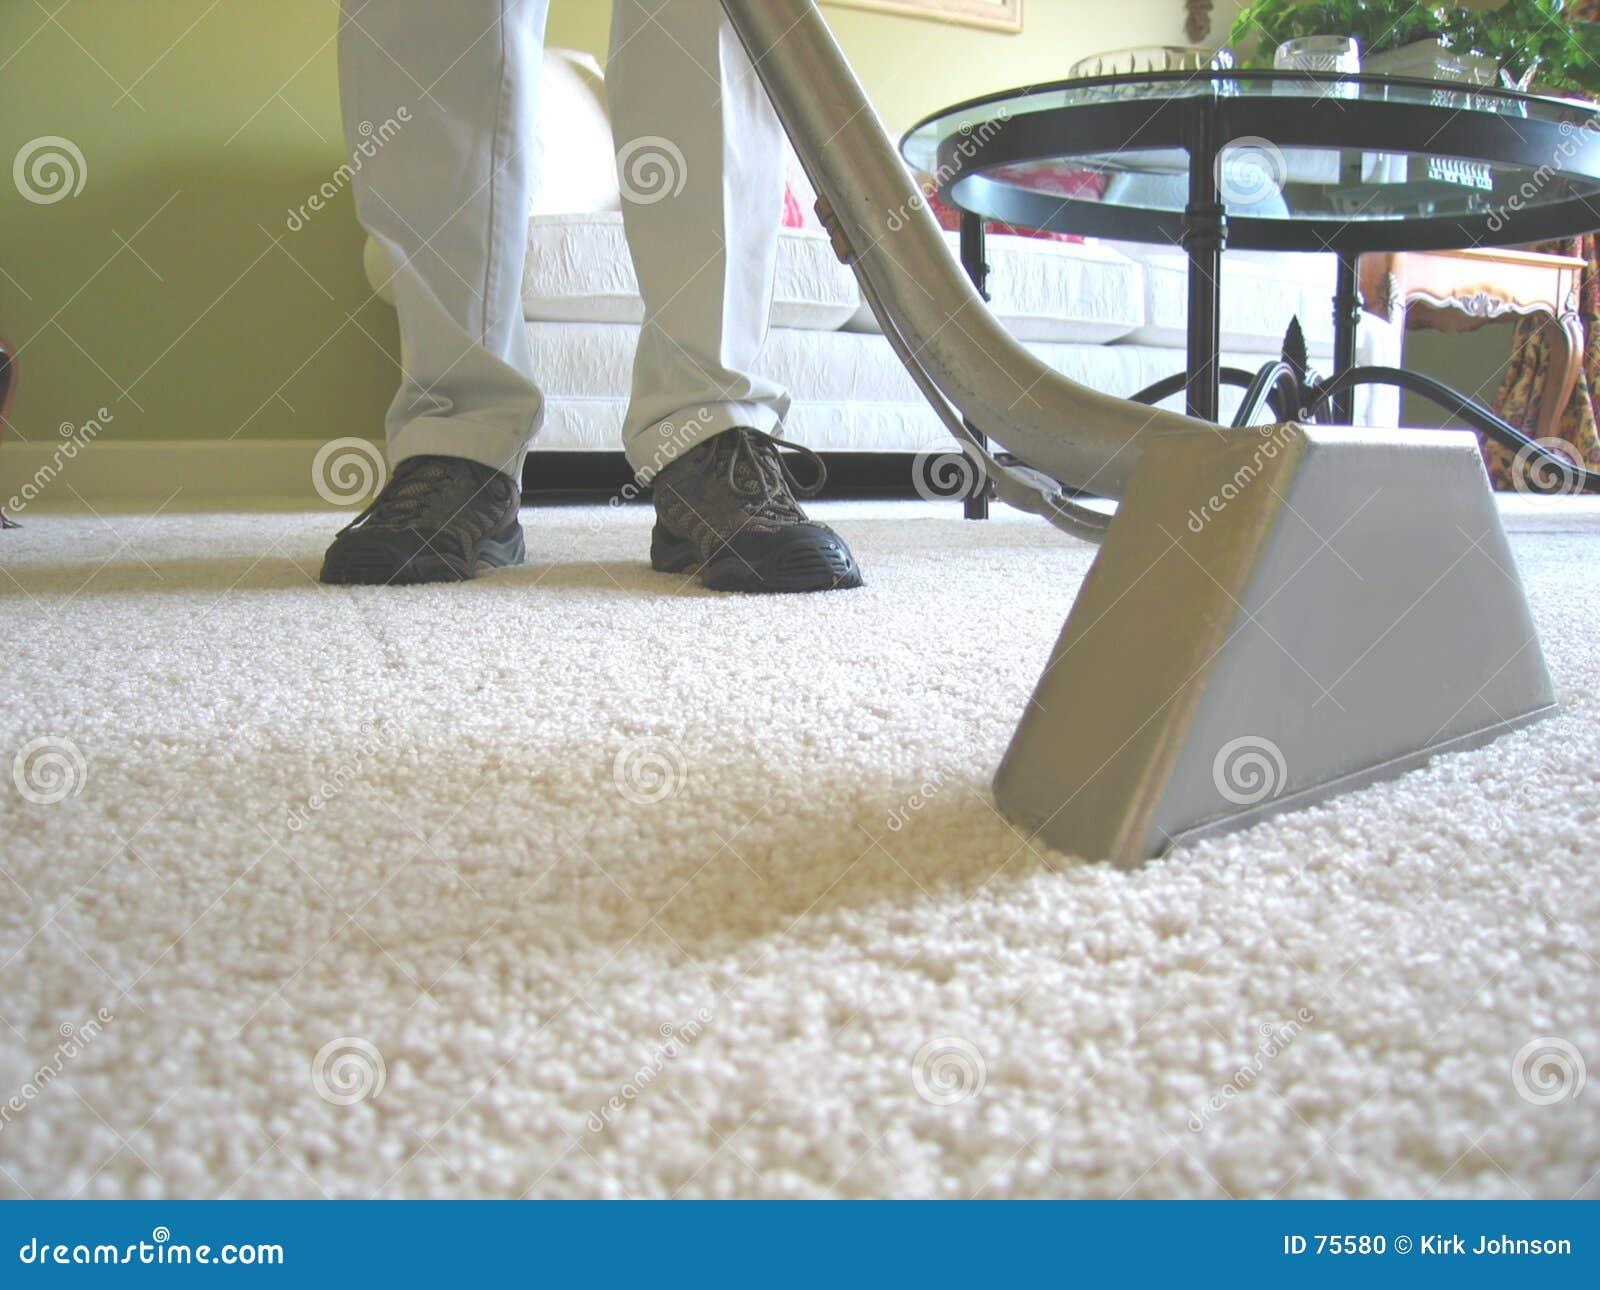 Vide de nettoyage de tapis